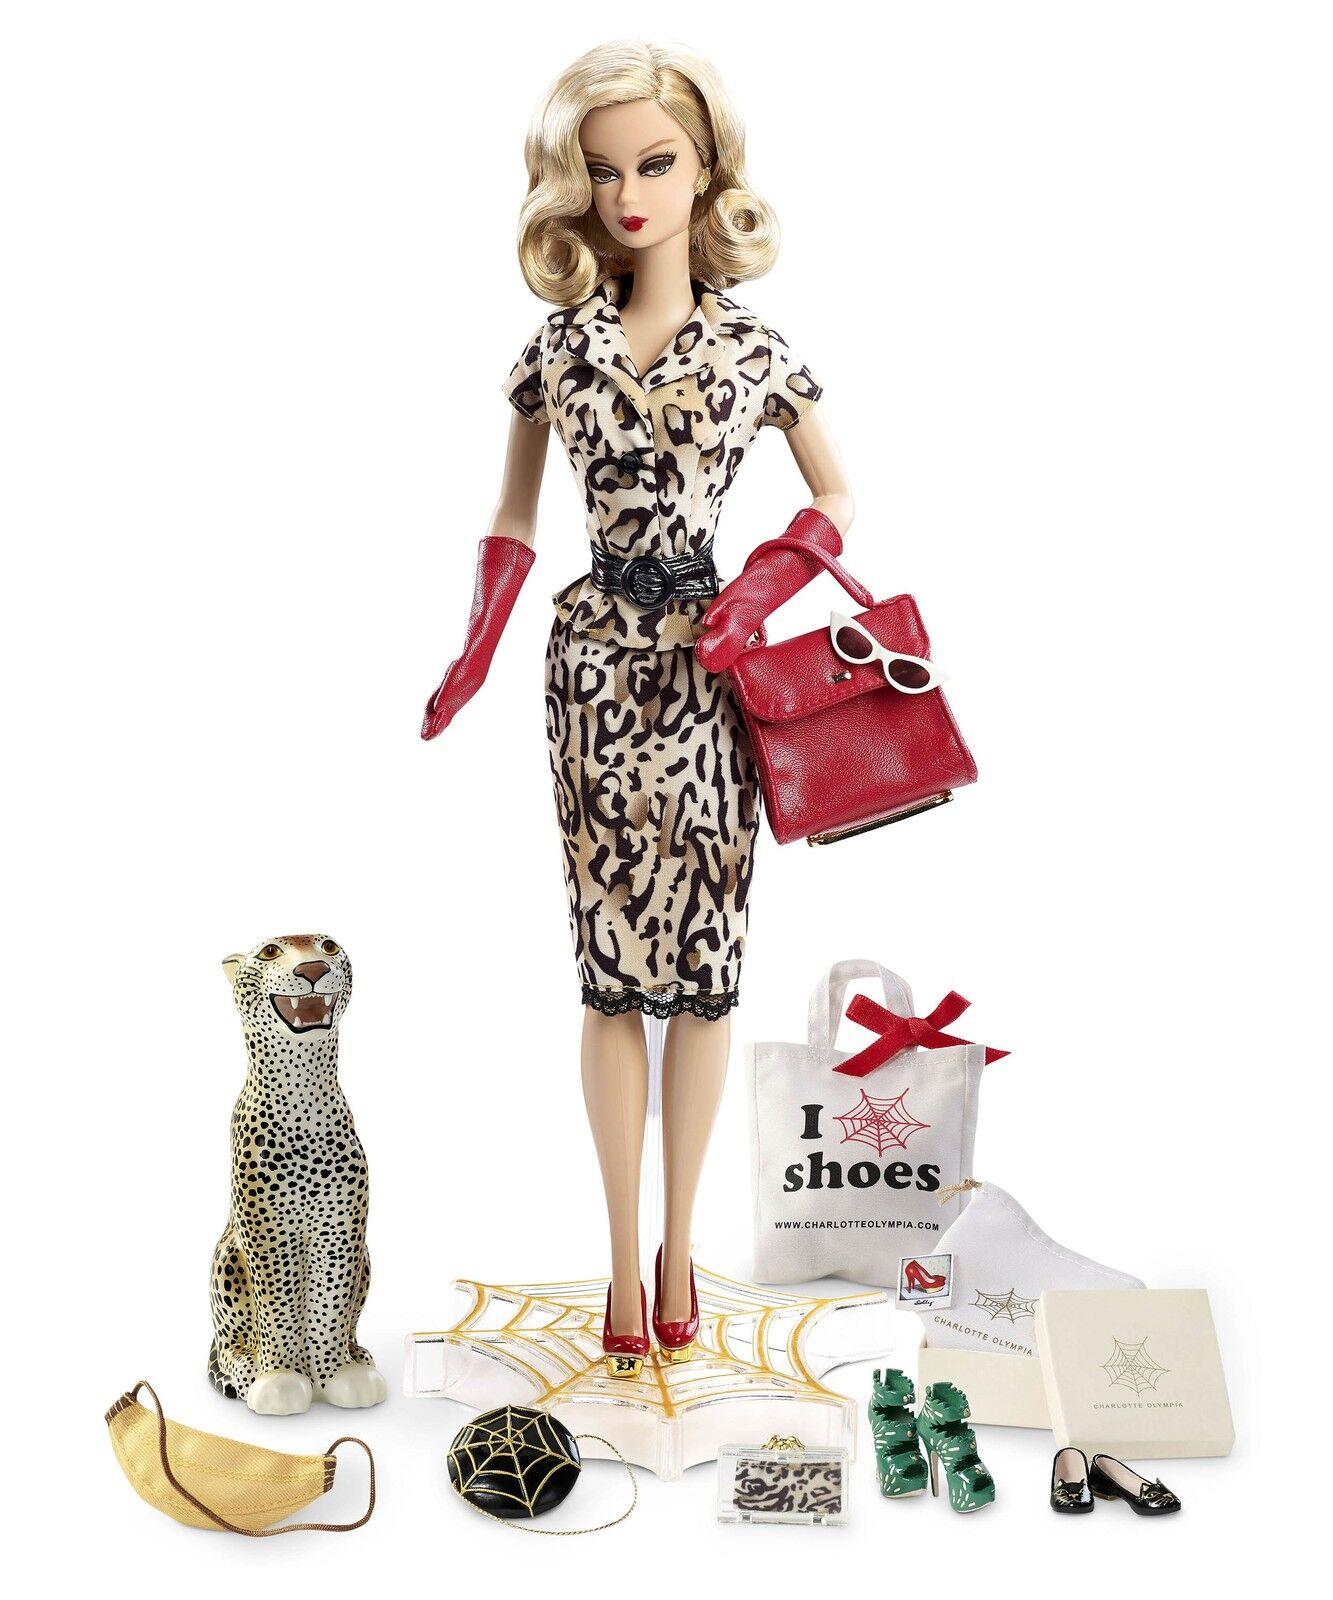 Muñeca Barbie Collector Charlotte Olympia oro Label Barbie Muñeca en el tejido